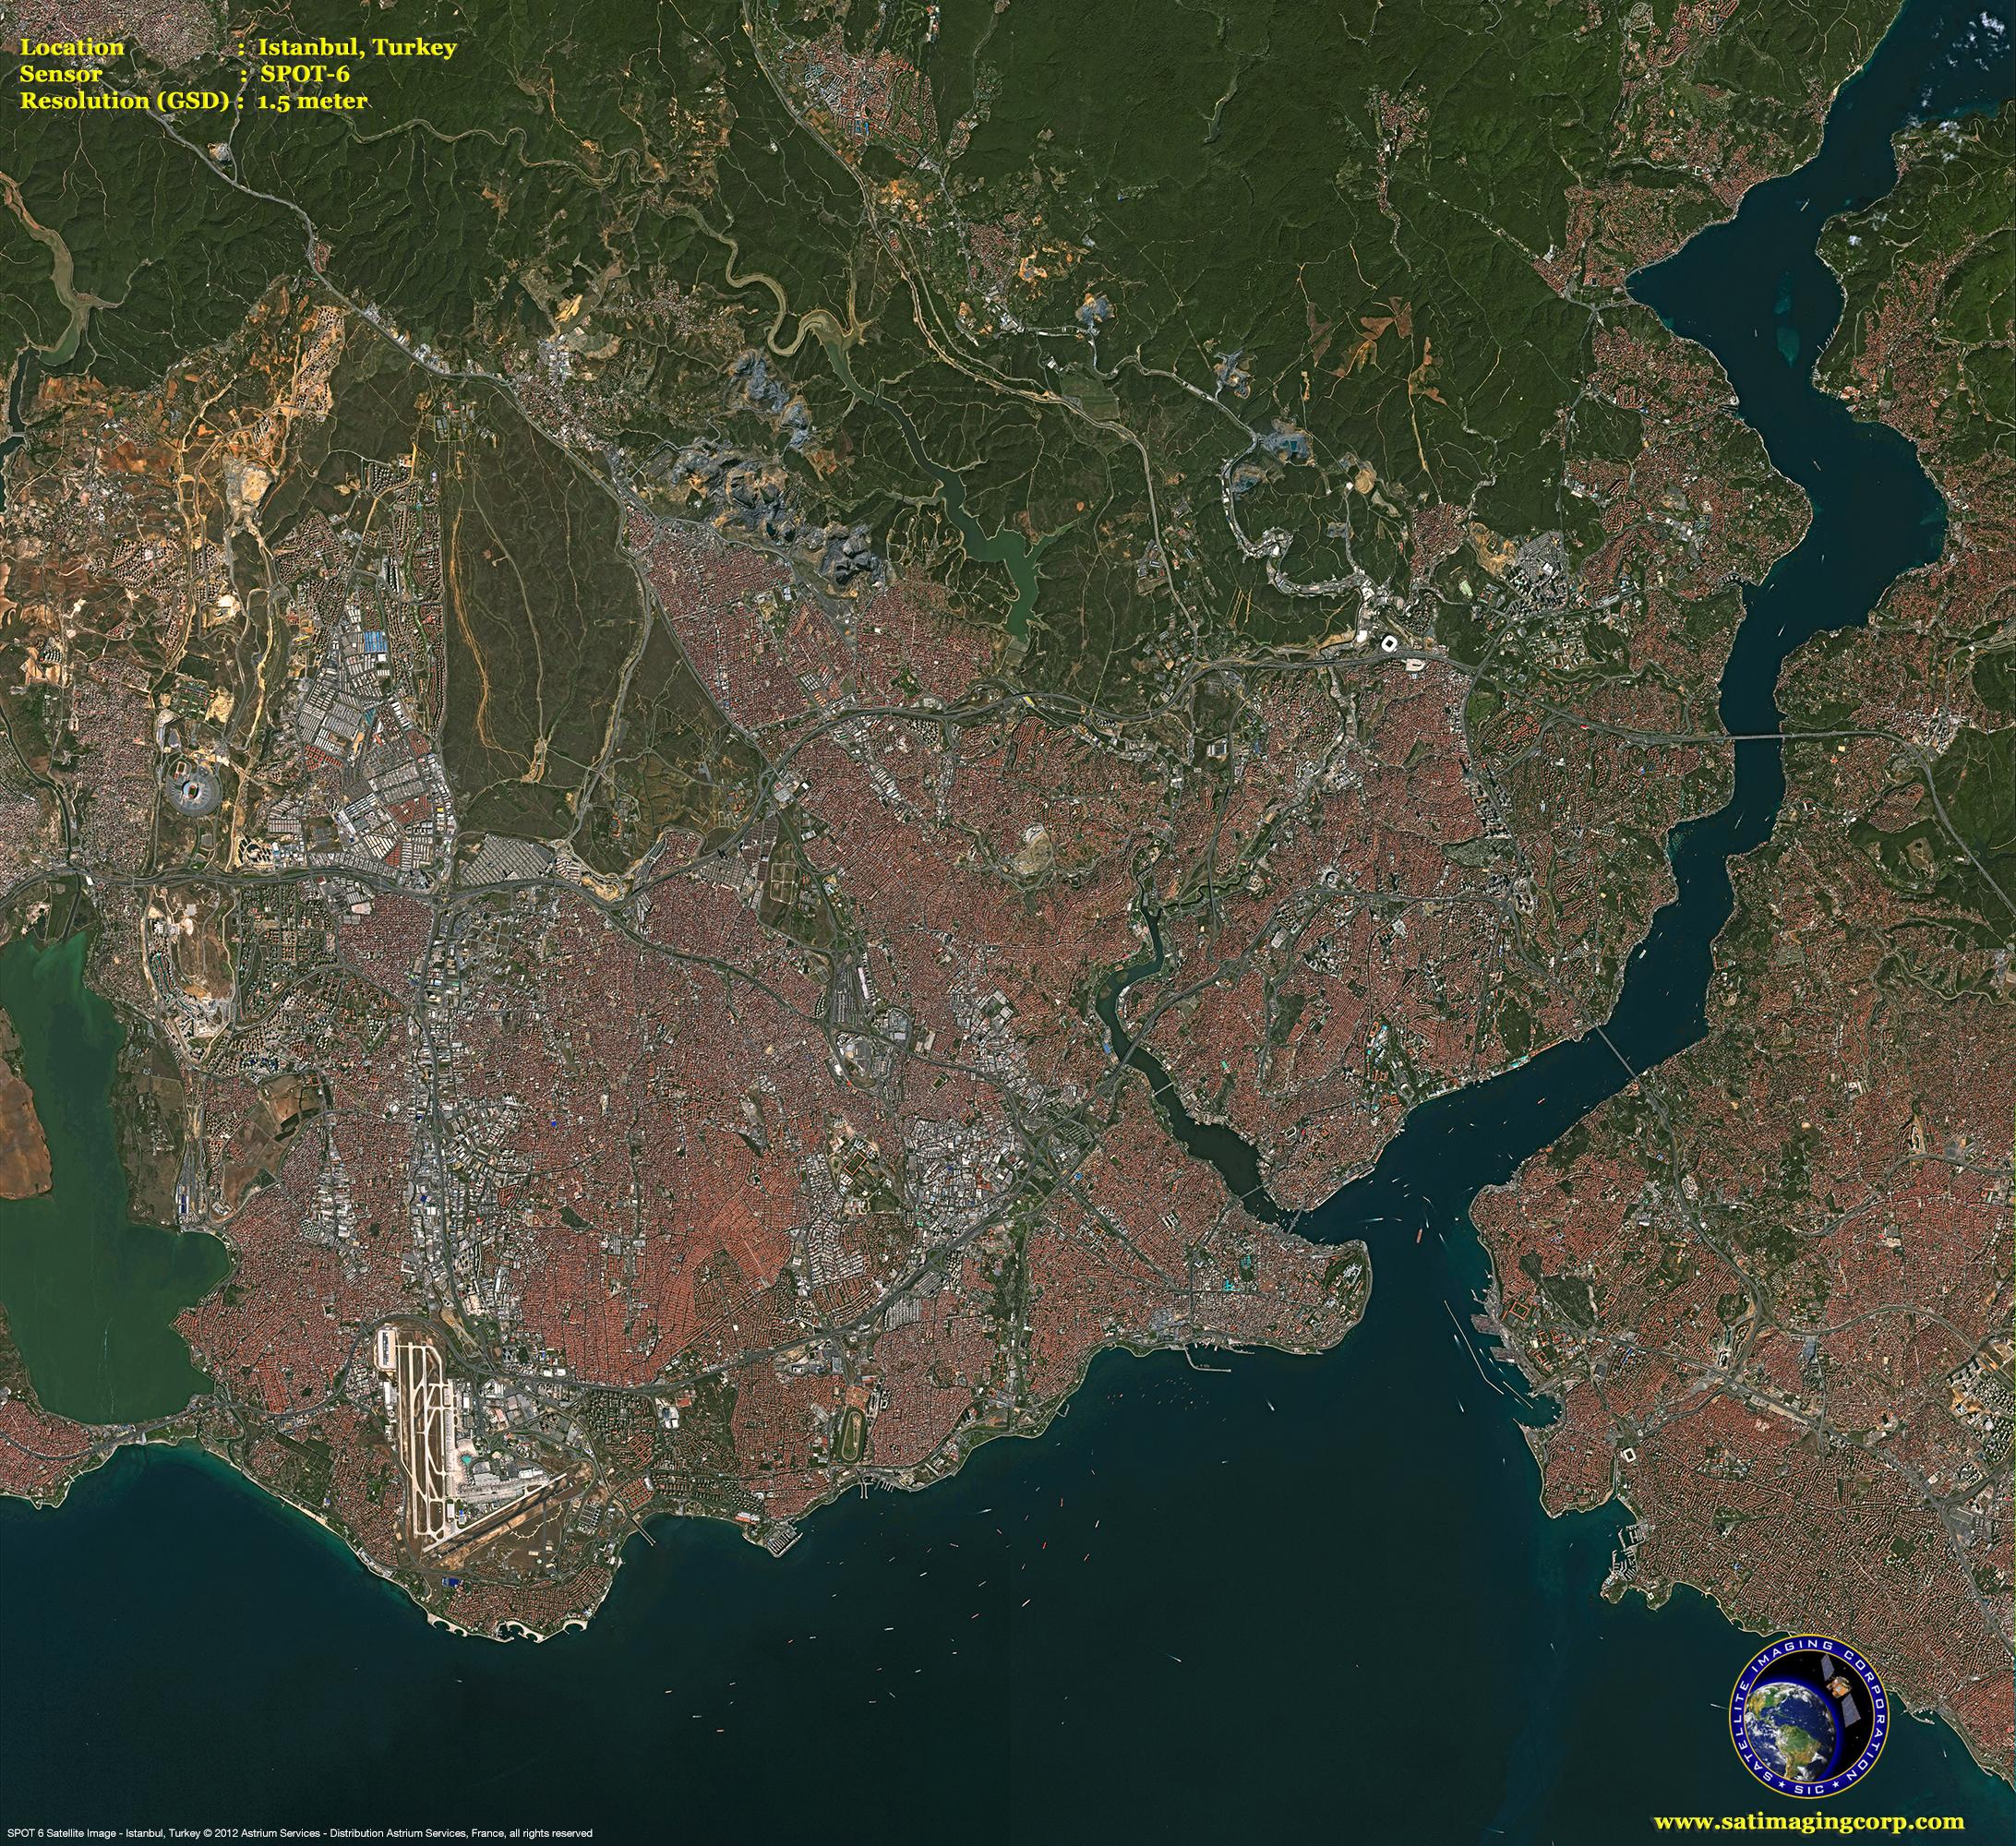 SPOT Satellite Image Of Istanbul Turkey Satellite Imaging Corp - Satellite image map